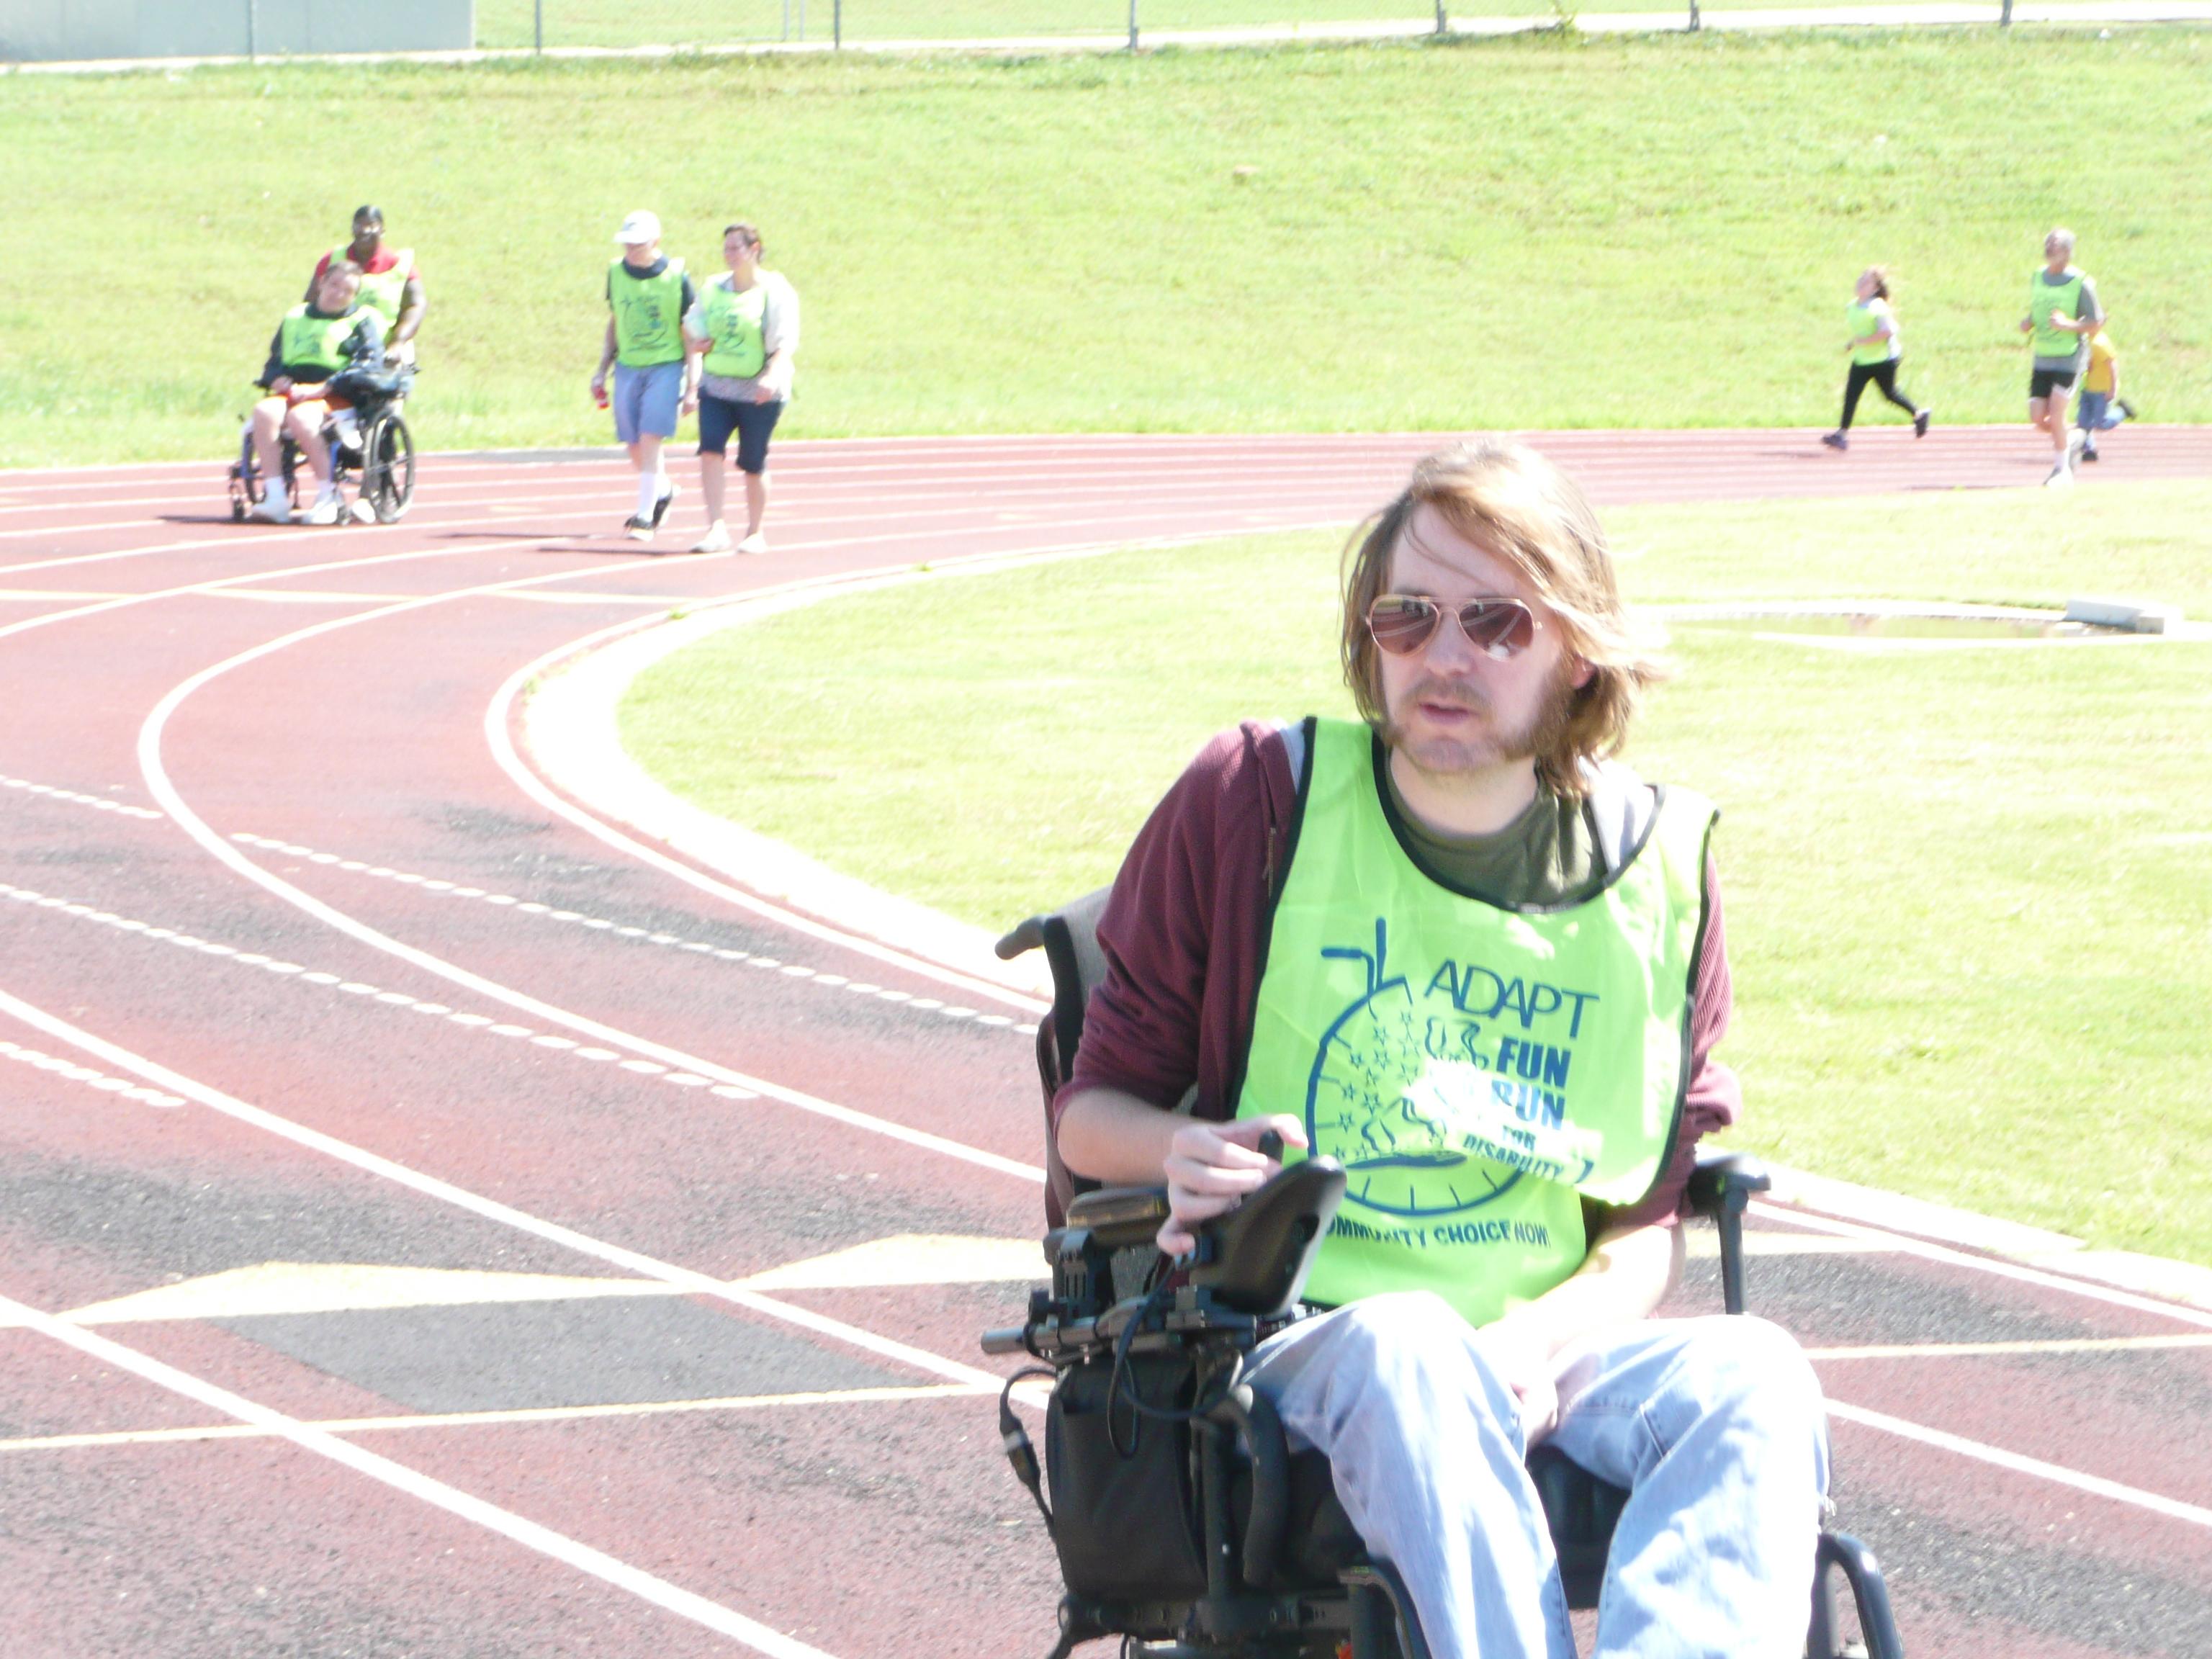 Eric Clow steers his motorized wheelchair around the Yellow Jacket Stadium track